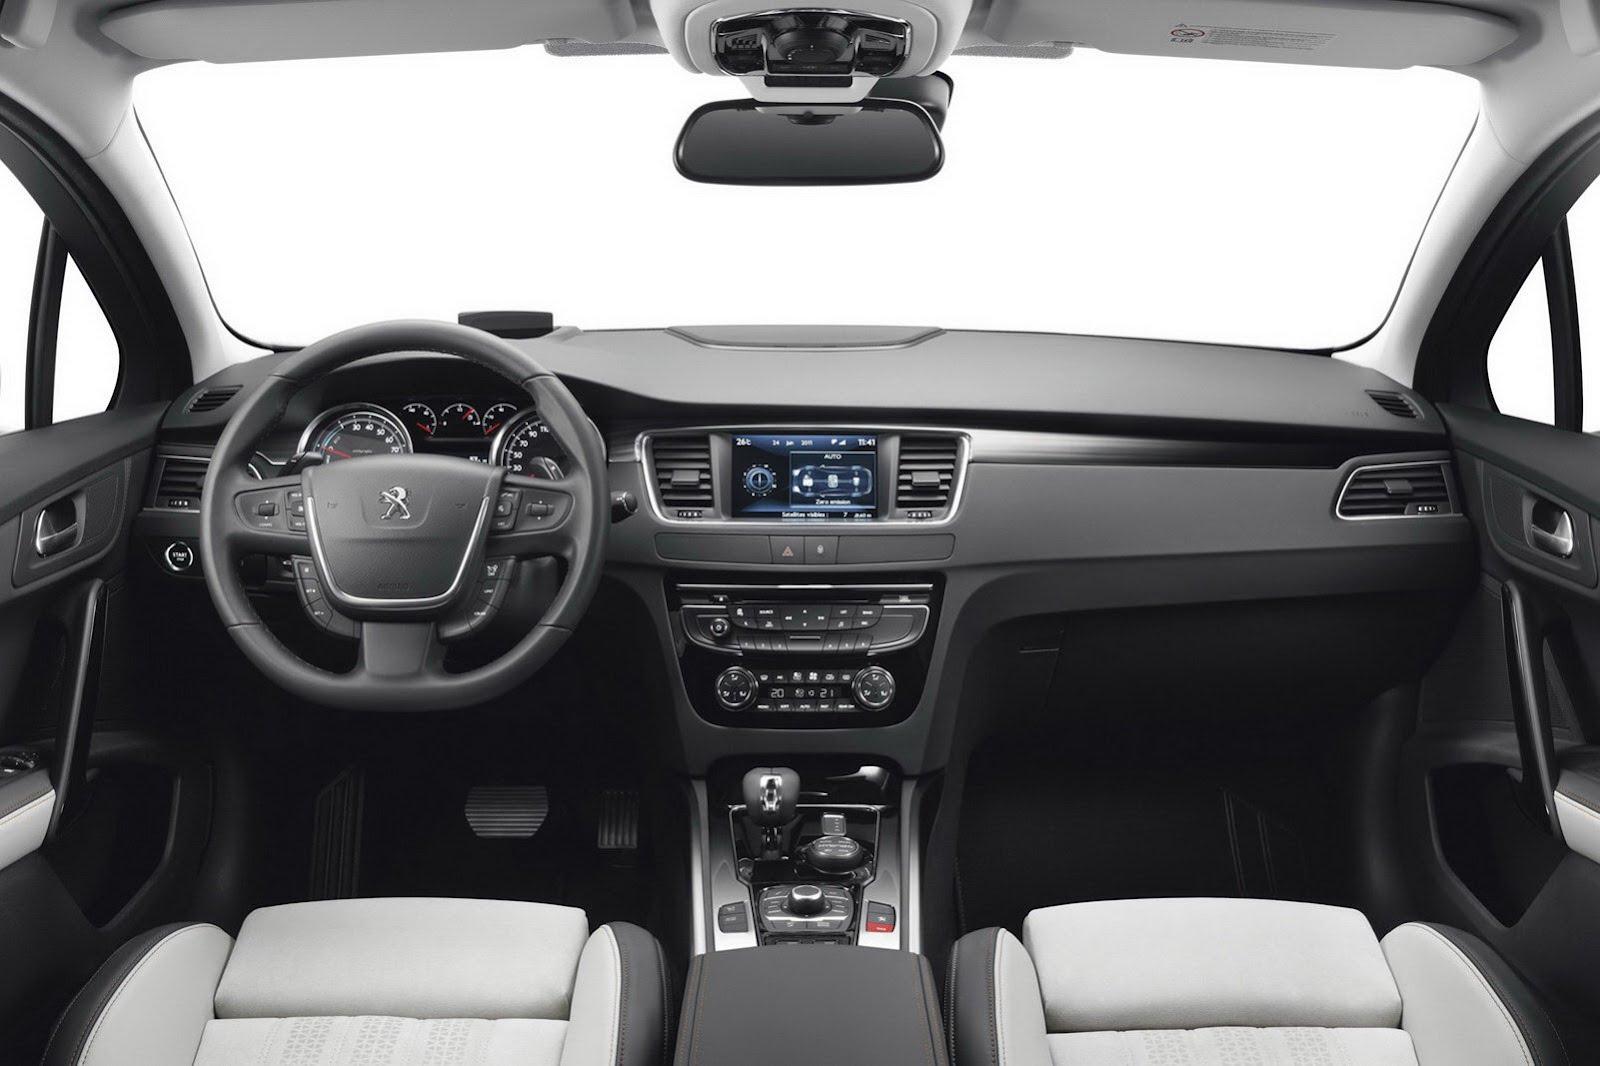 [Resim: 2012-Peugeot-508-Hybrid4-Full-Hybrid-Die...mgmax=1800]